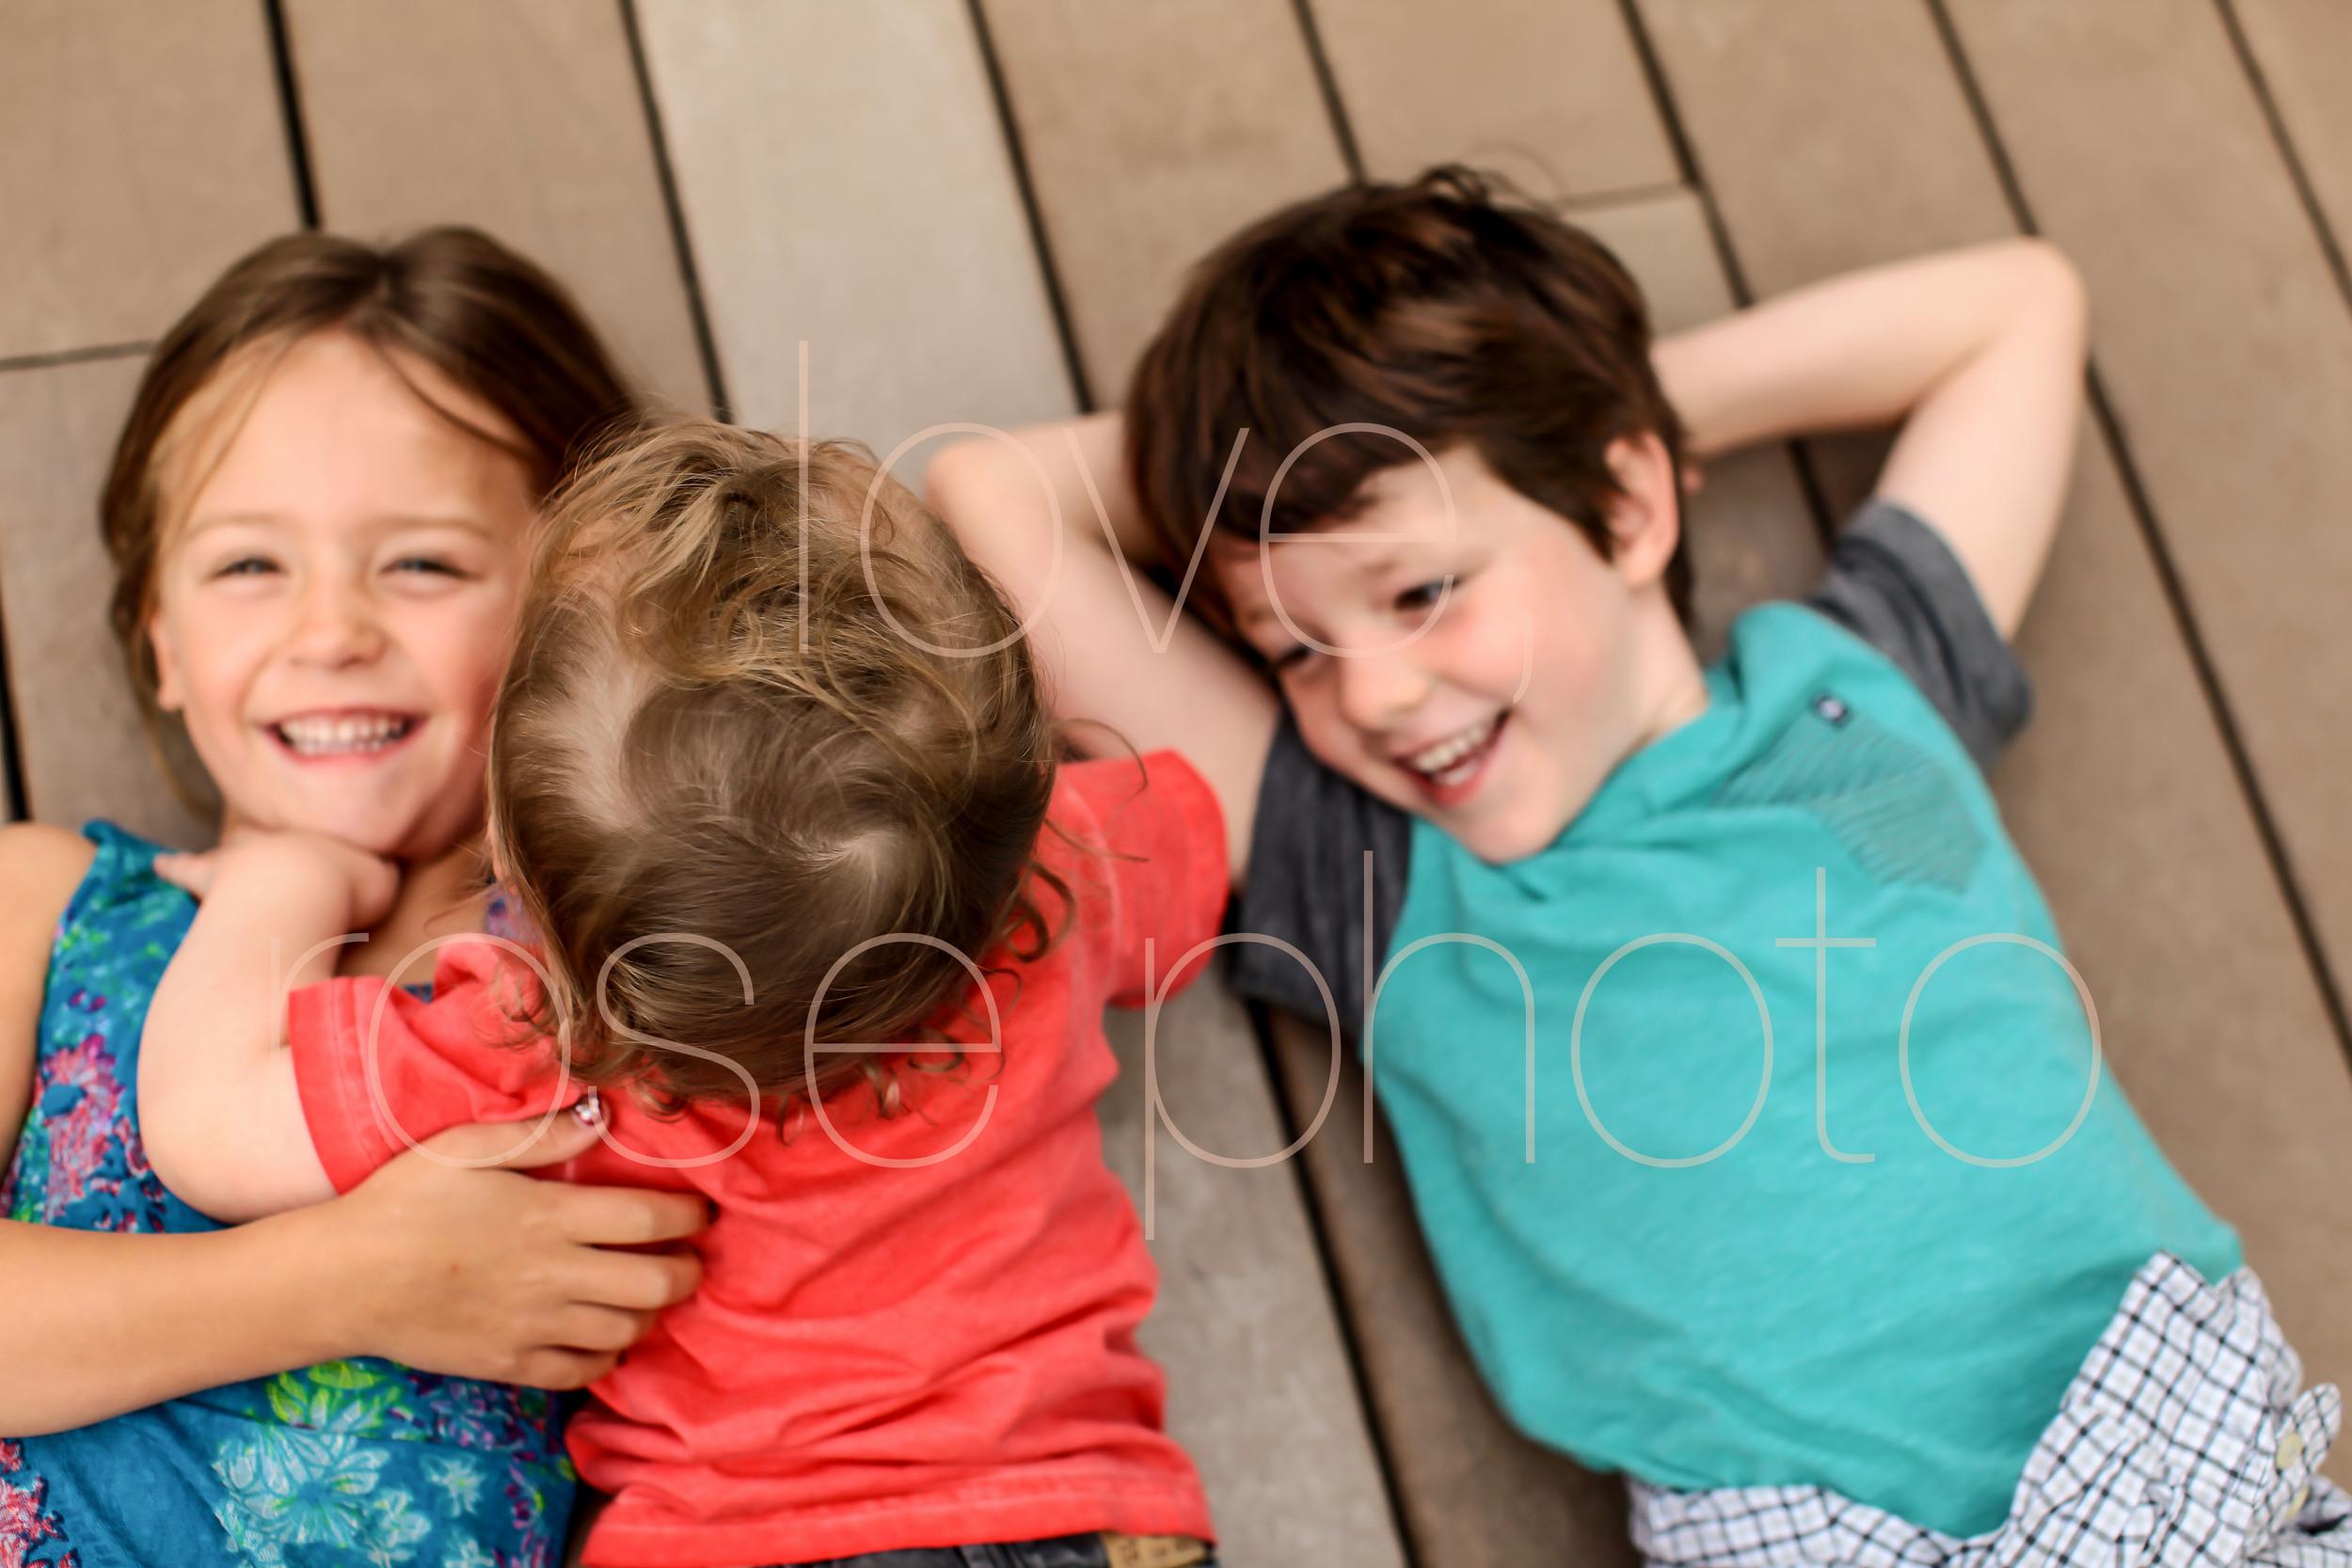 C Ensign chicago lifestyle photographic sessoin lincoln park kids portrait photographer gap kids-007.jpg